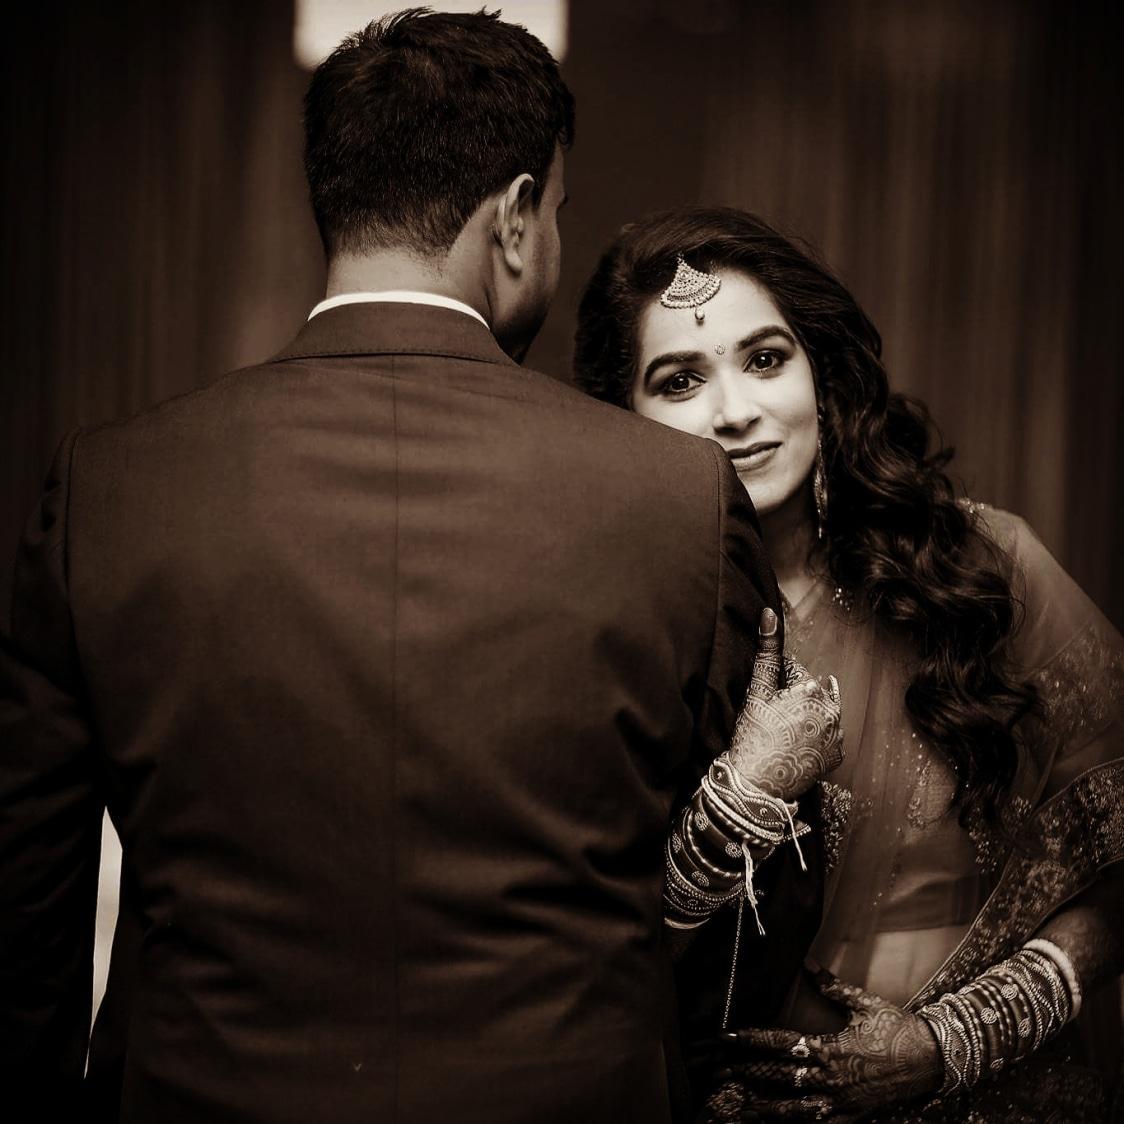 Classic Bride and Groom Pose by Priyanka Wedding-photography | Weddings Photos & Ideas